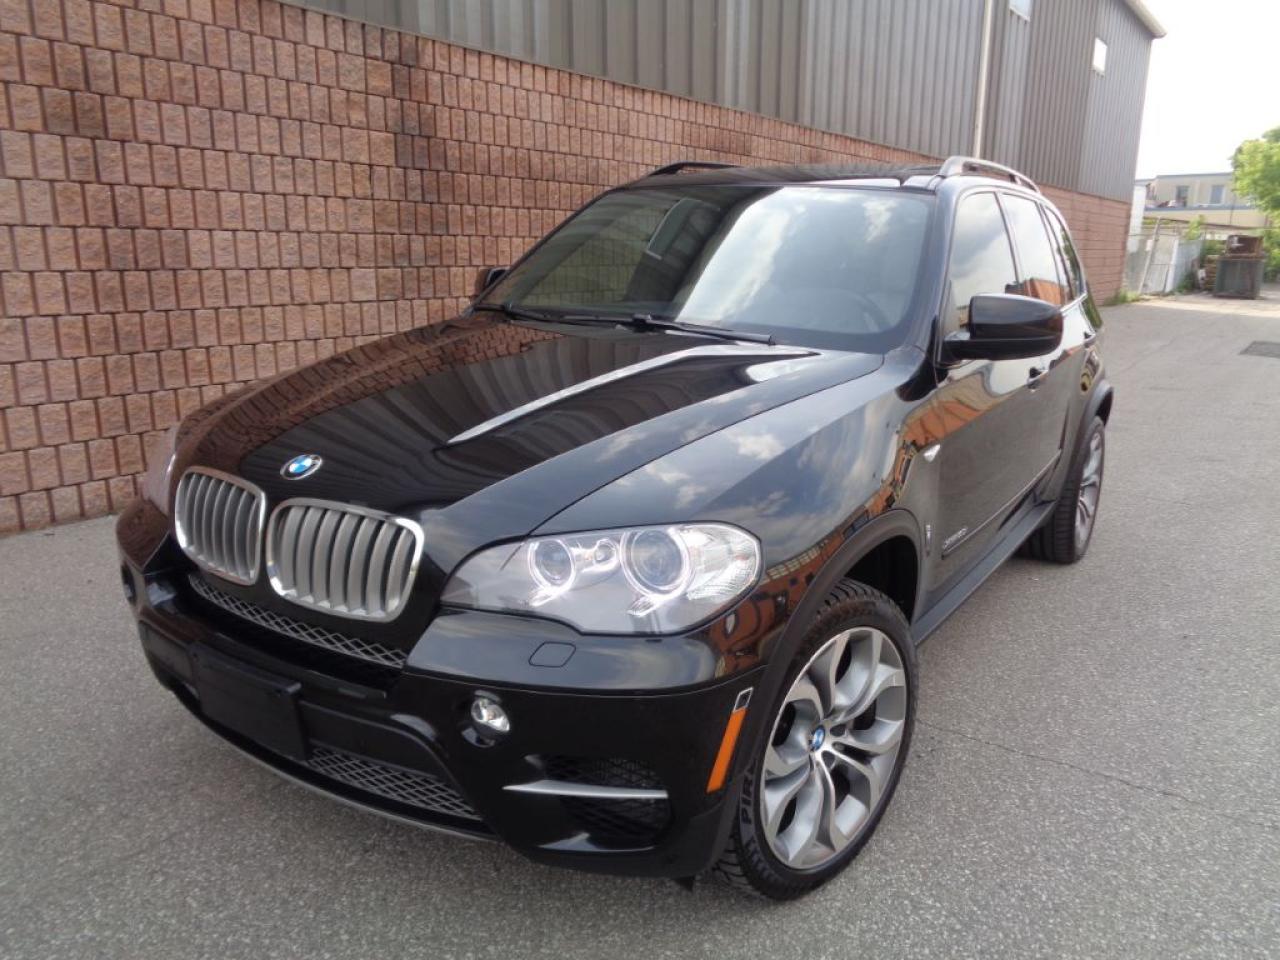 2013 BMW X5 ***SOLD***